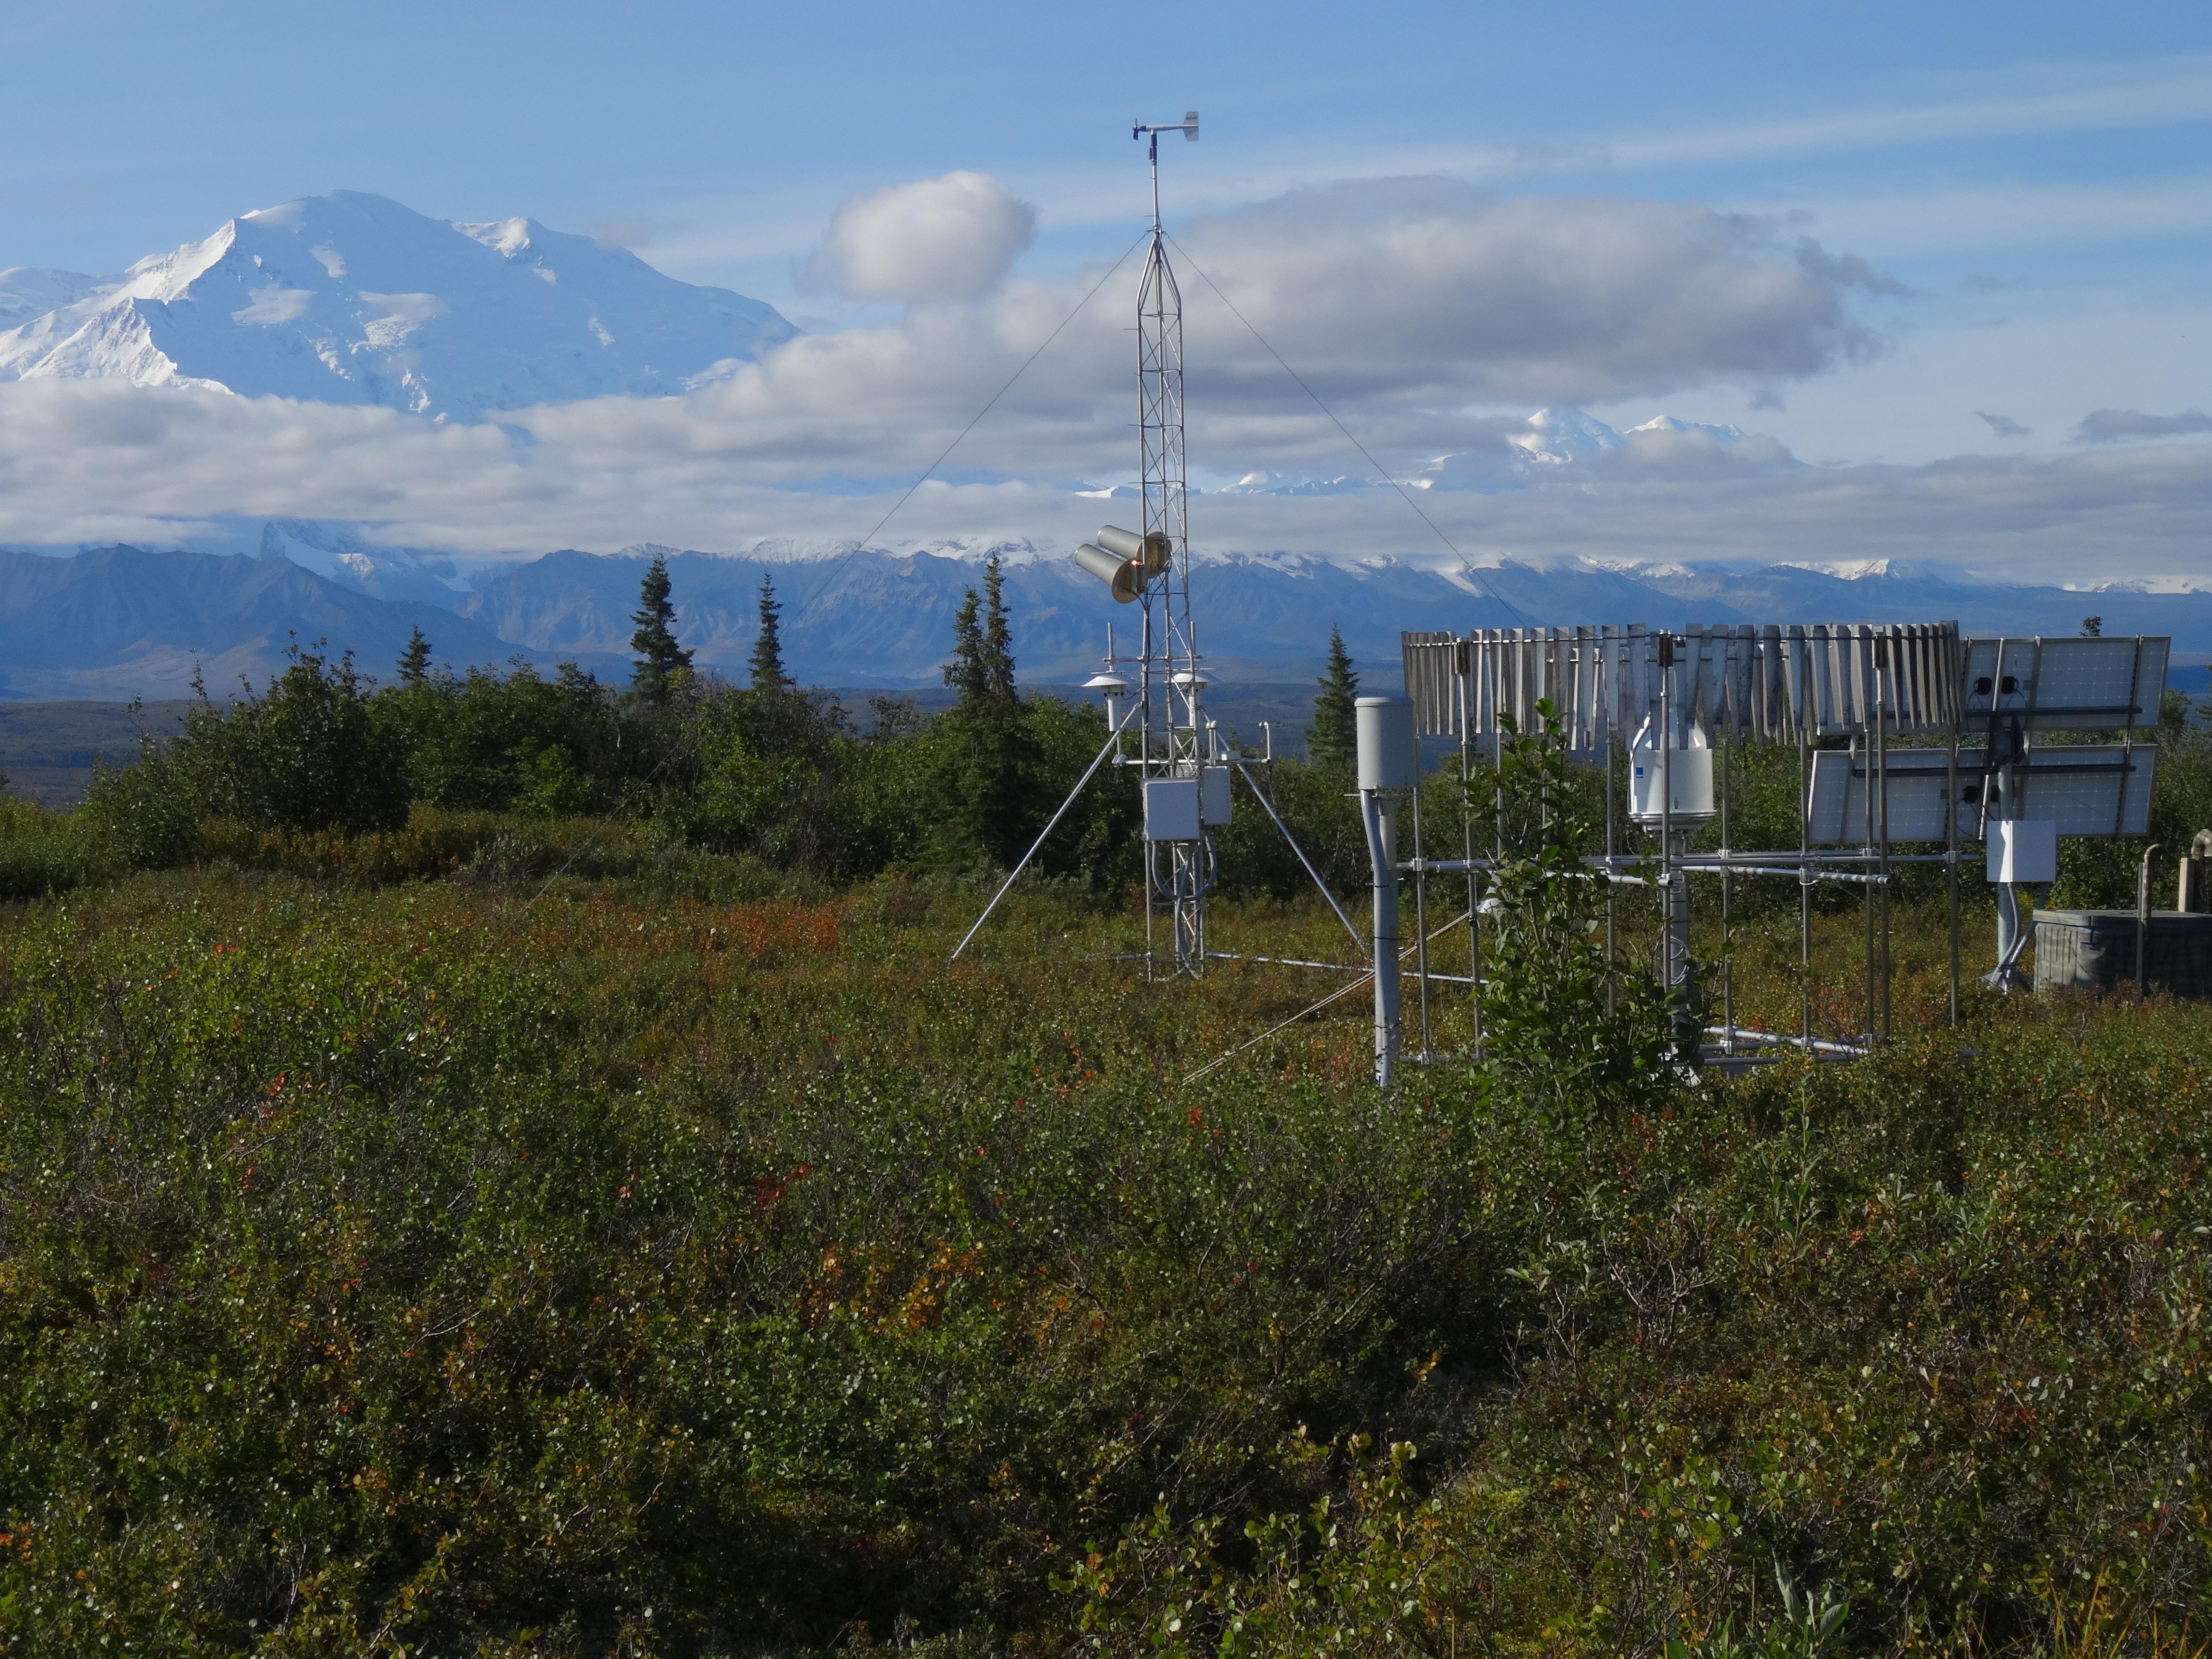 The new environmental monitoring station 27 miles north of Denali mountain in Alaska.